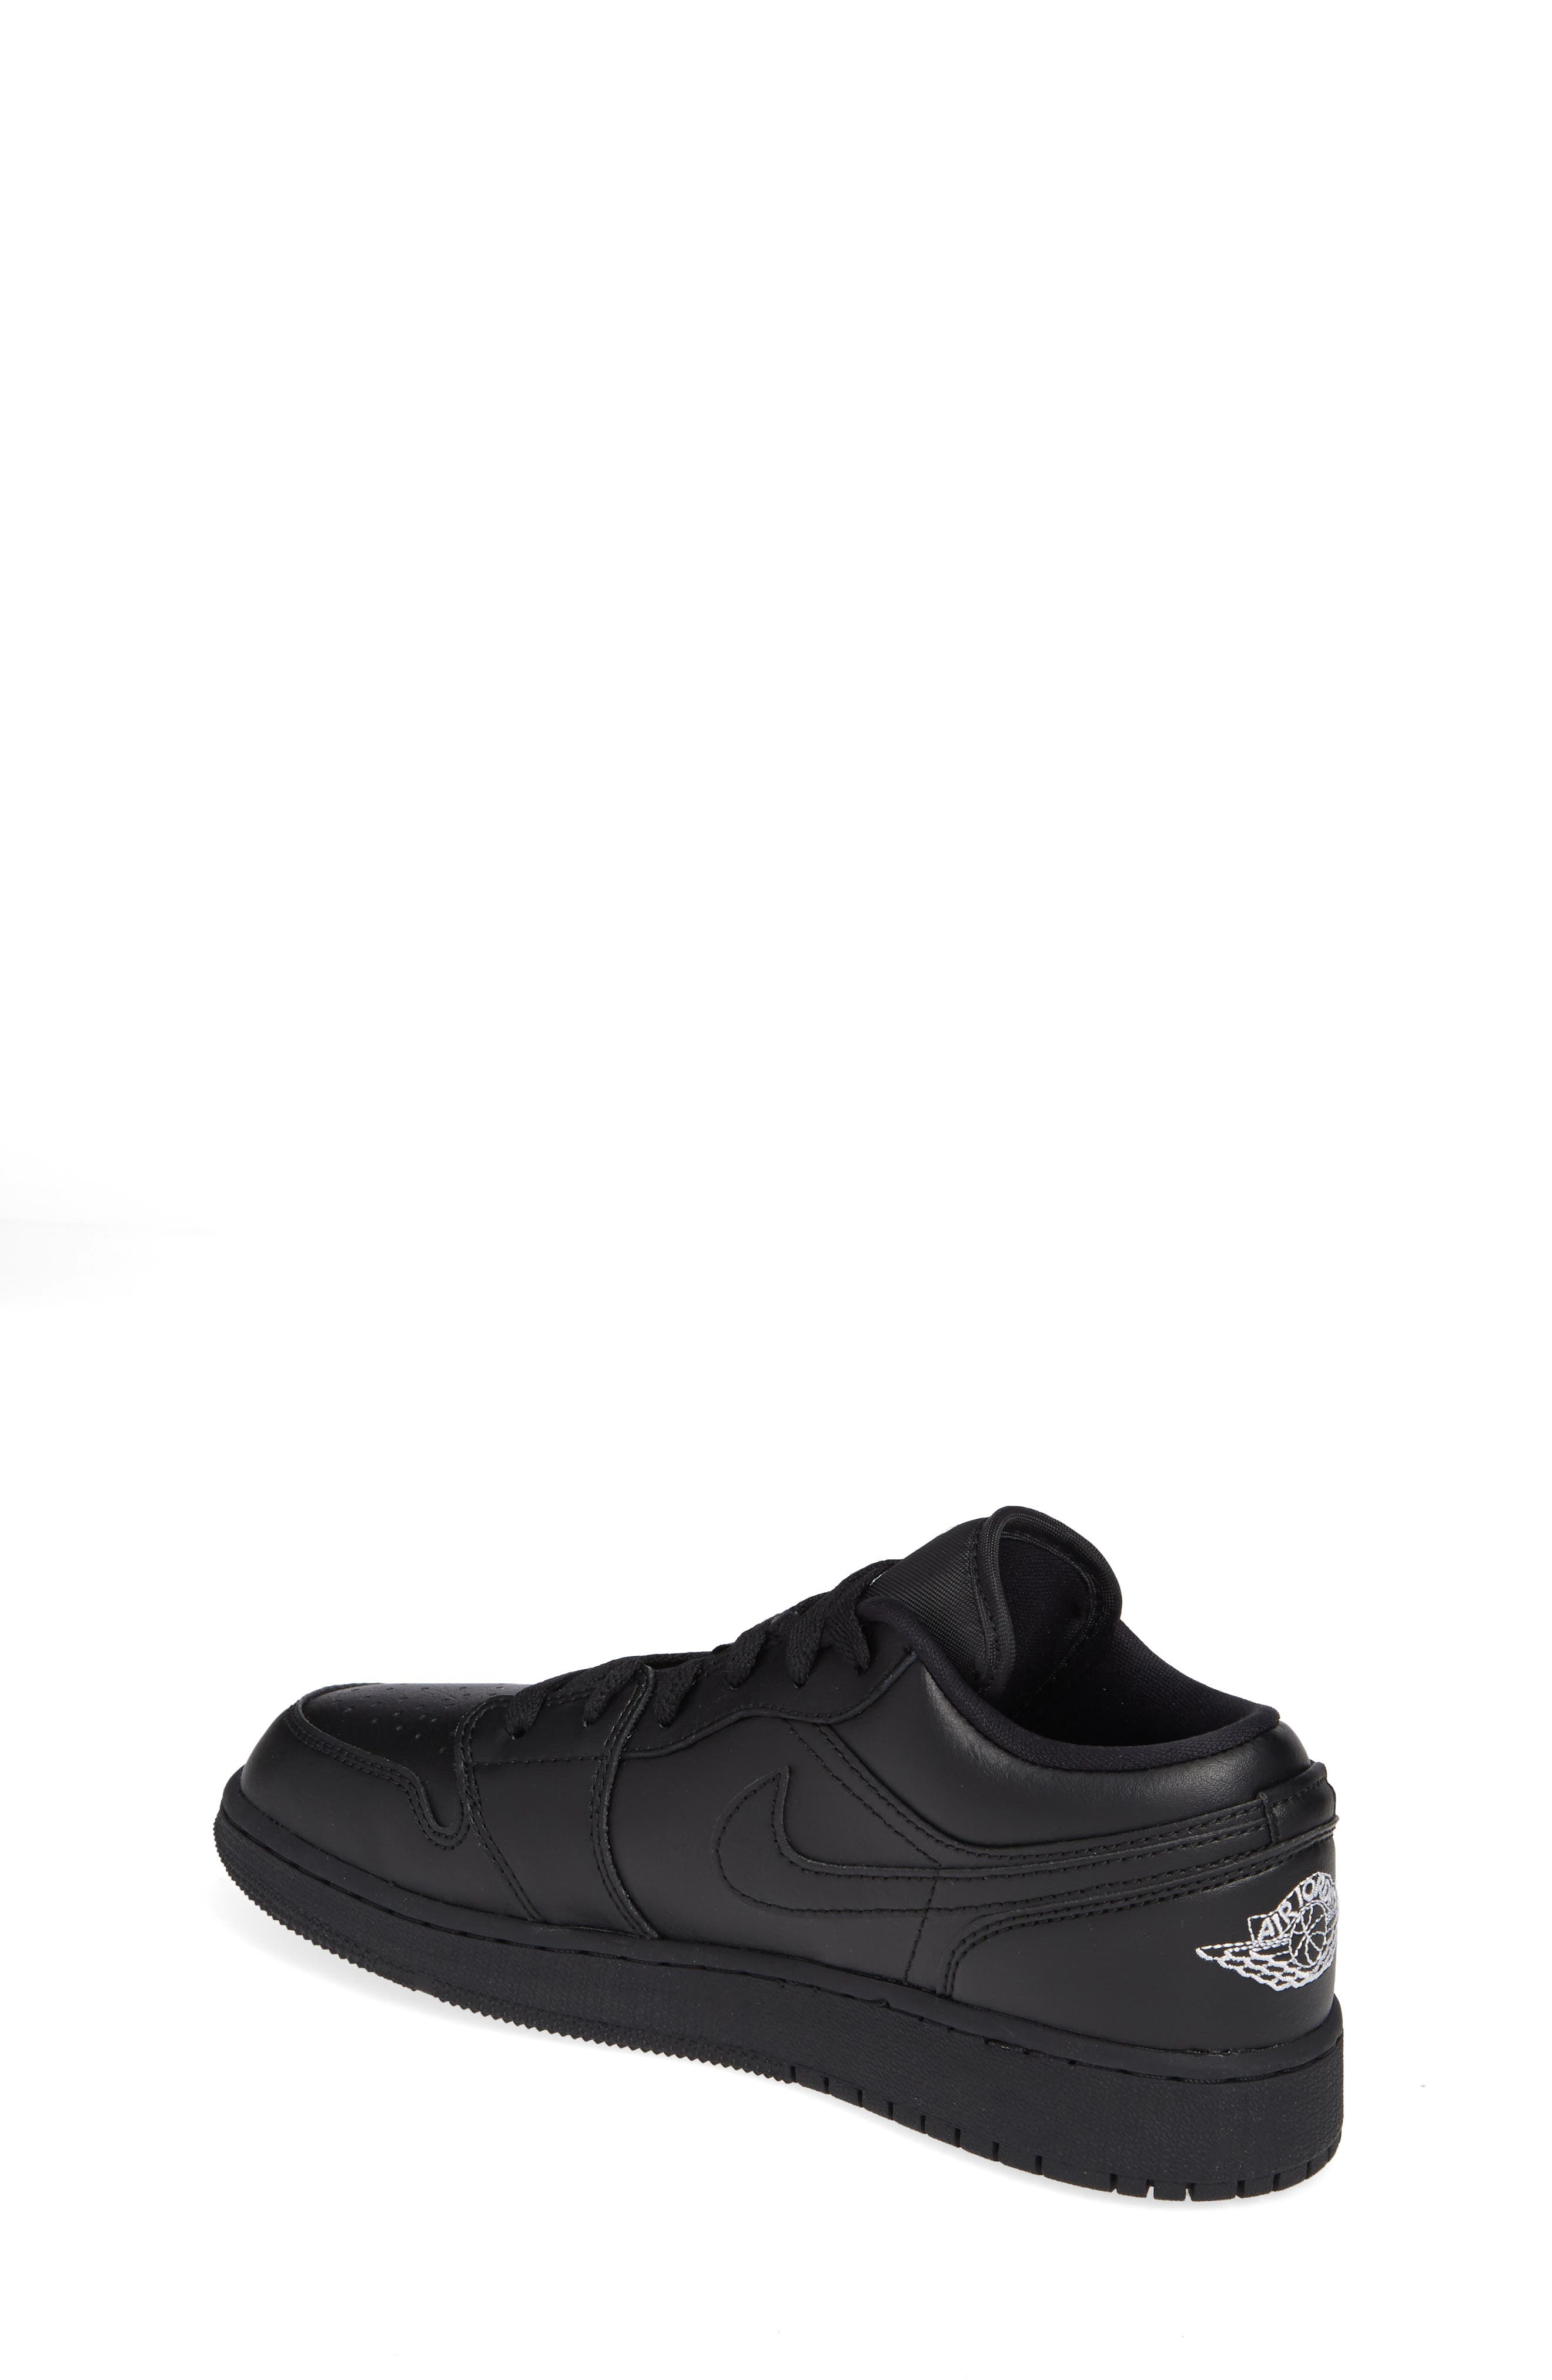 Nike 'Air Jordan 1 Low' Sneaker,                             Alternate thumbnail 2, color,                             BLACK/ WHITE/ BLACK